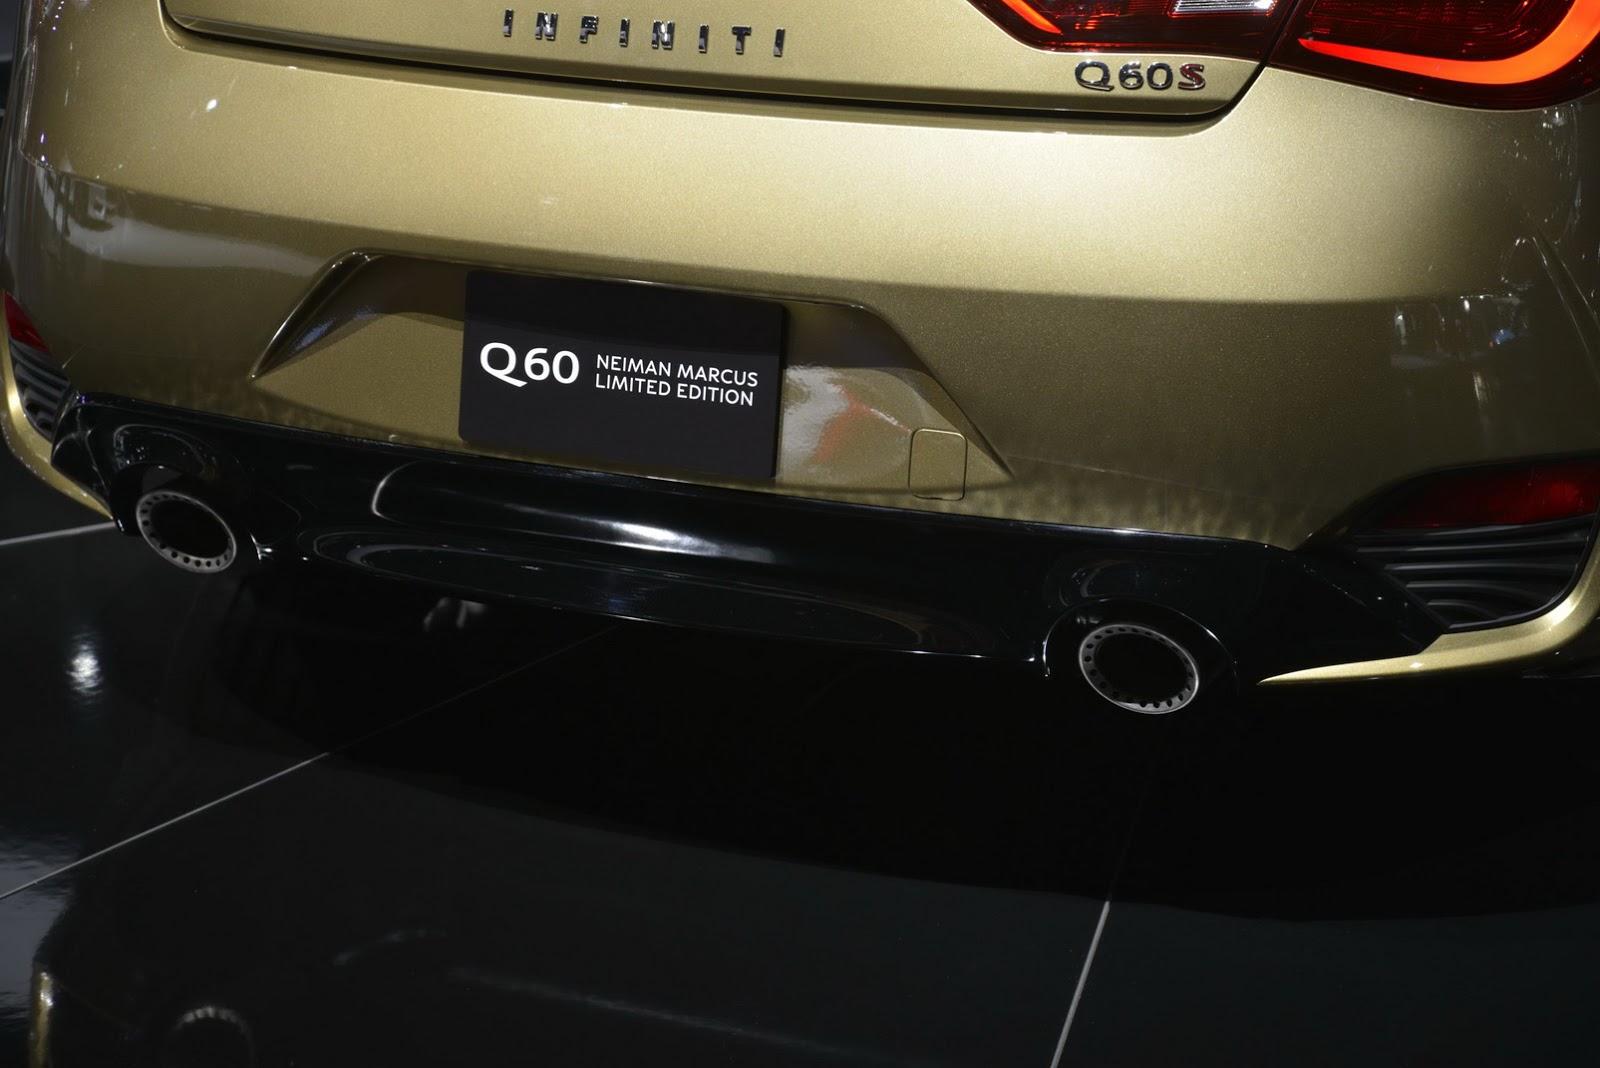 Infiniti Q60 Neiman Marcus Edition Limited